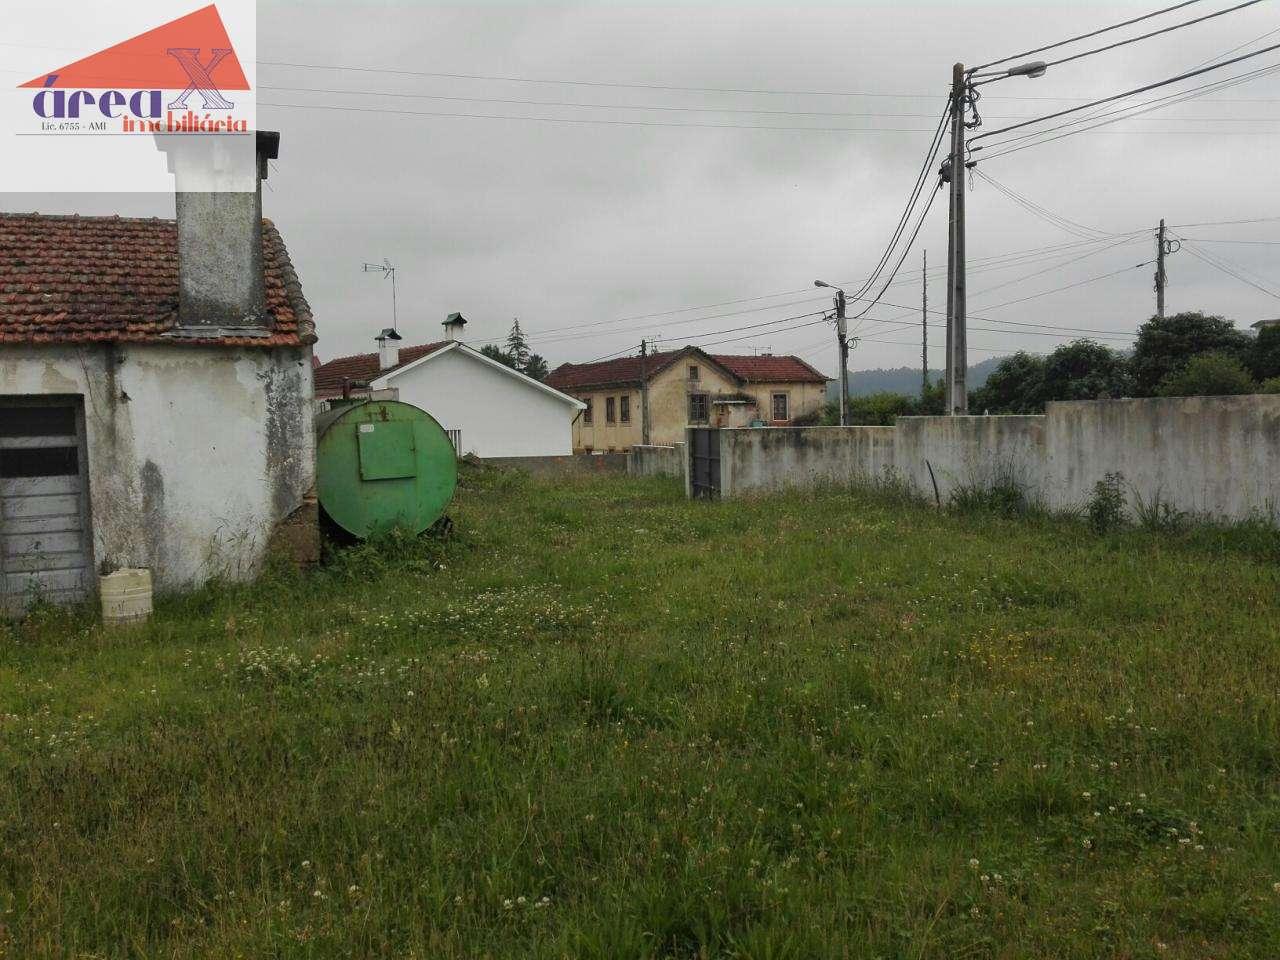 Terreno para comprar, Vila de Cucujães, Aveiro - Foto 3